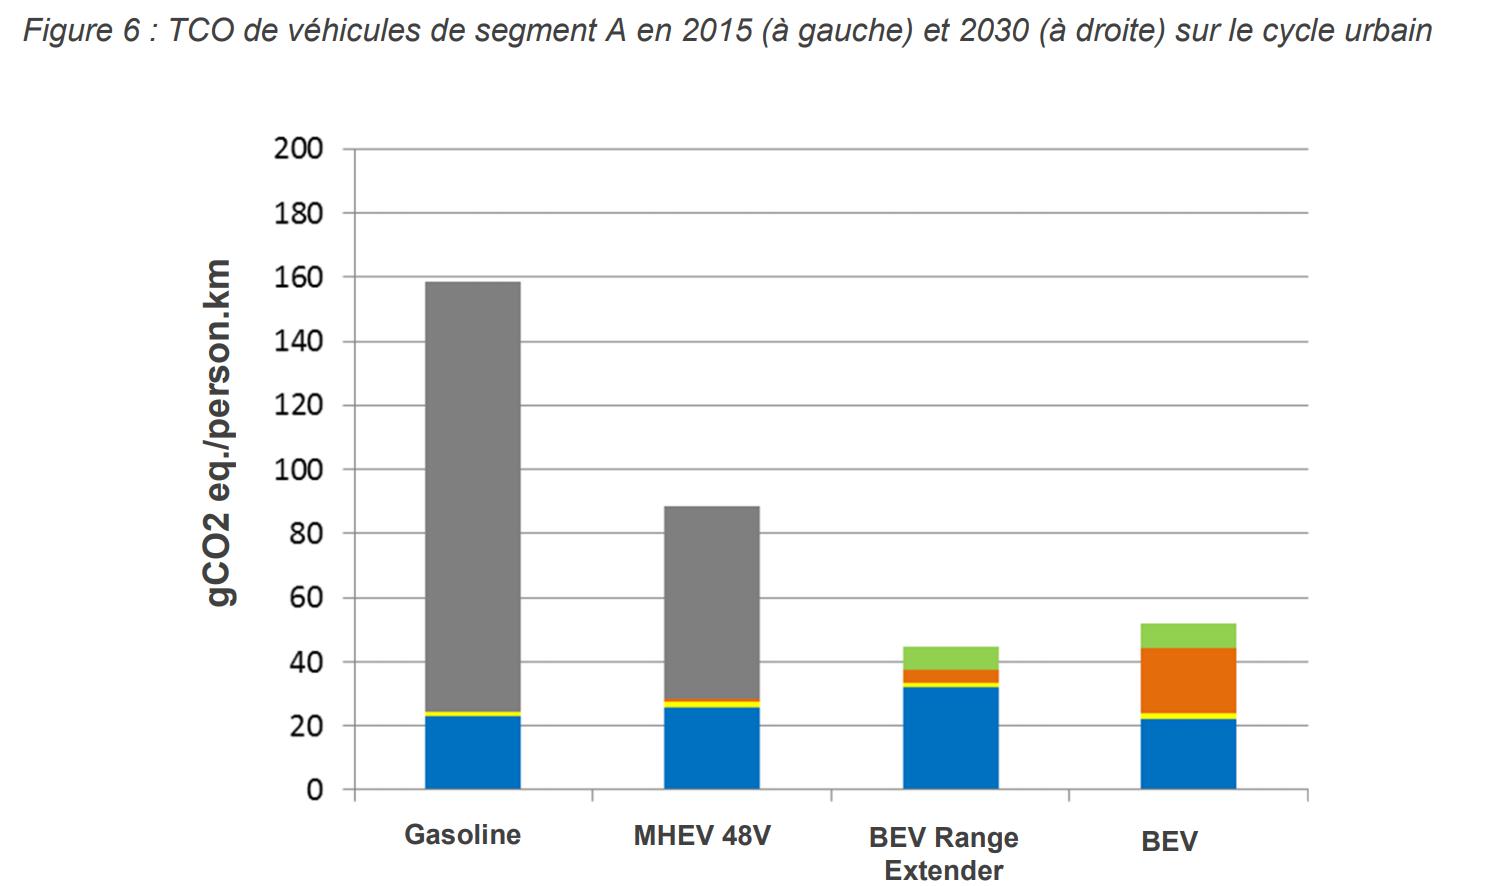 Bilan transversal de l'impact de l'électrification par segment